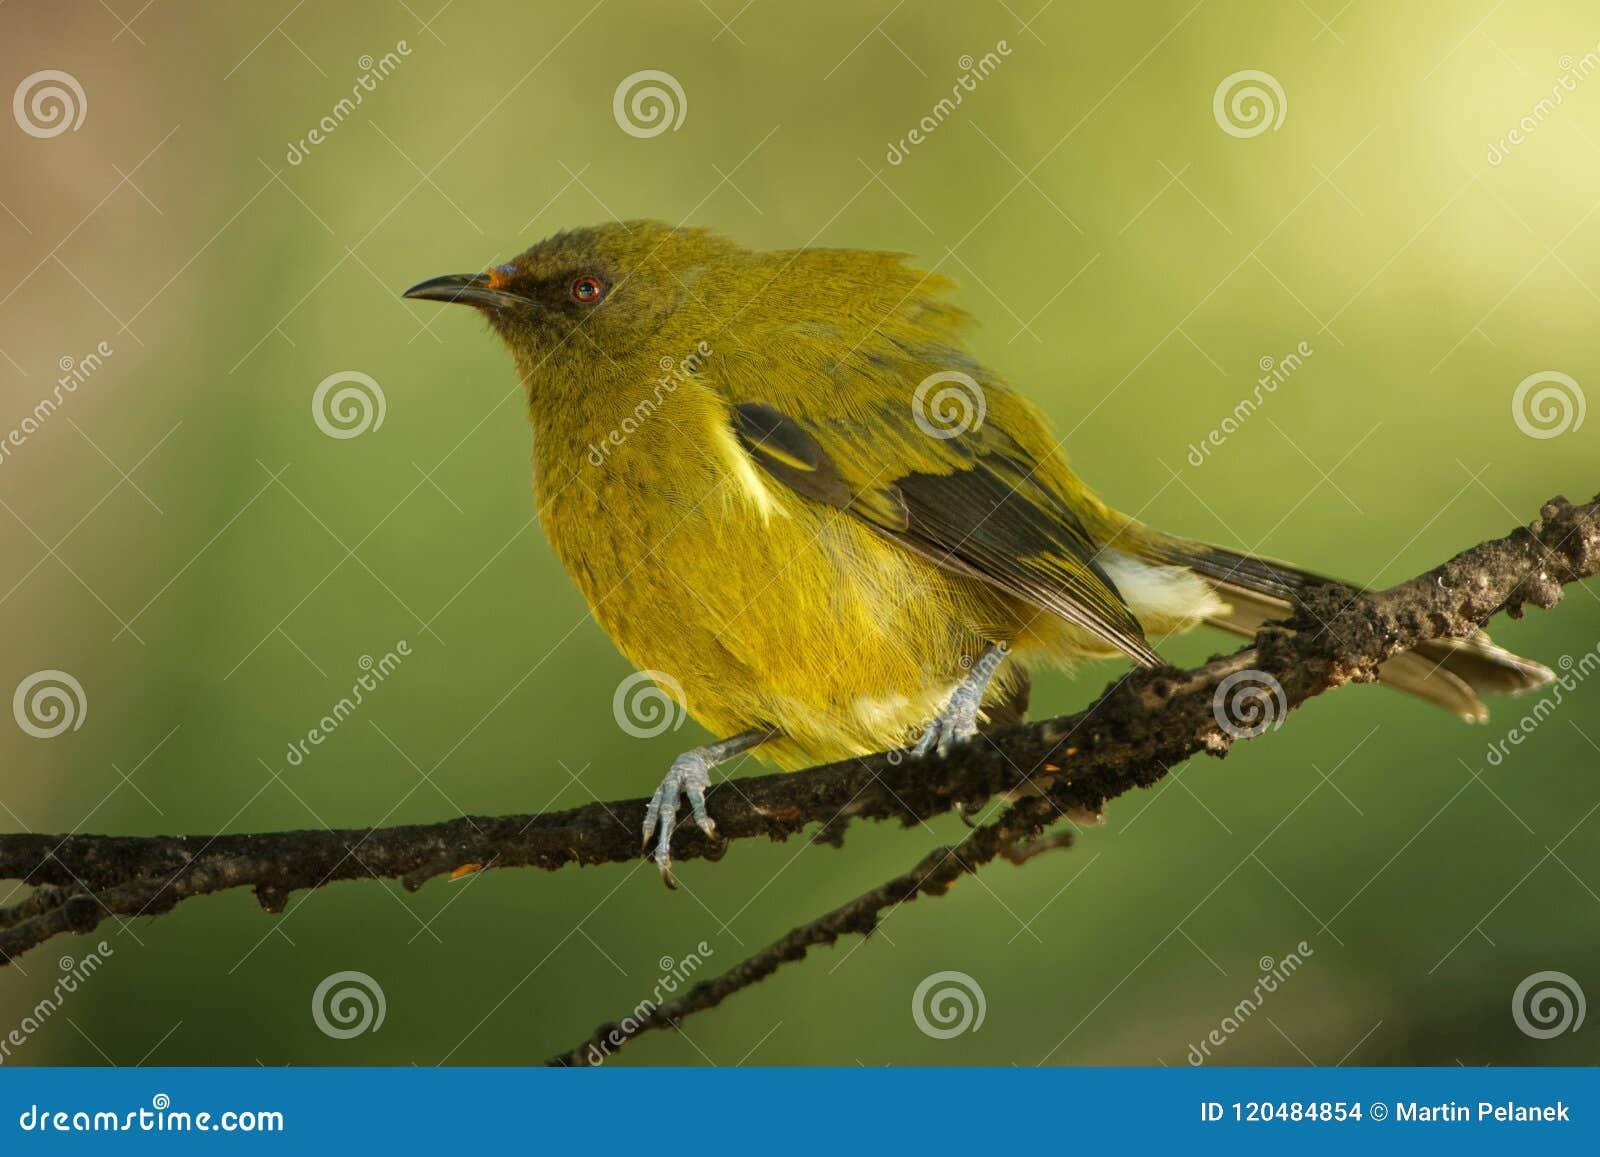 Bellbird - Anthornis melanura - makomako in Maori language, endemic bird - honeyeater from New Zealand in the green forest